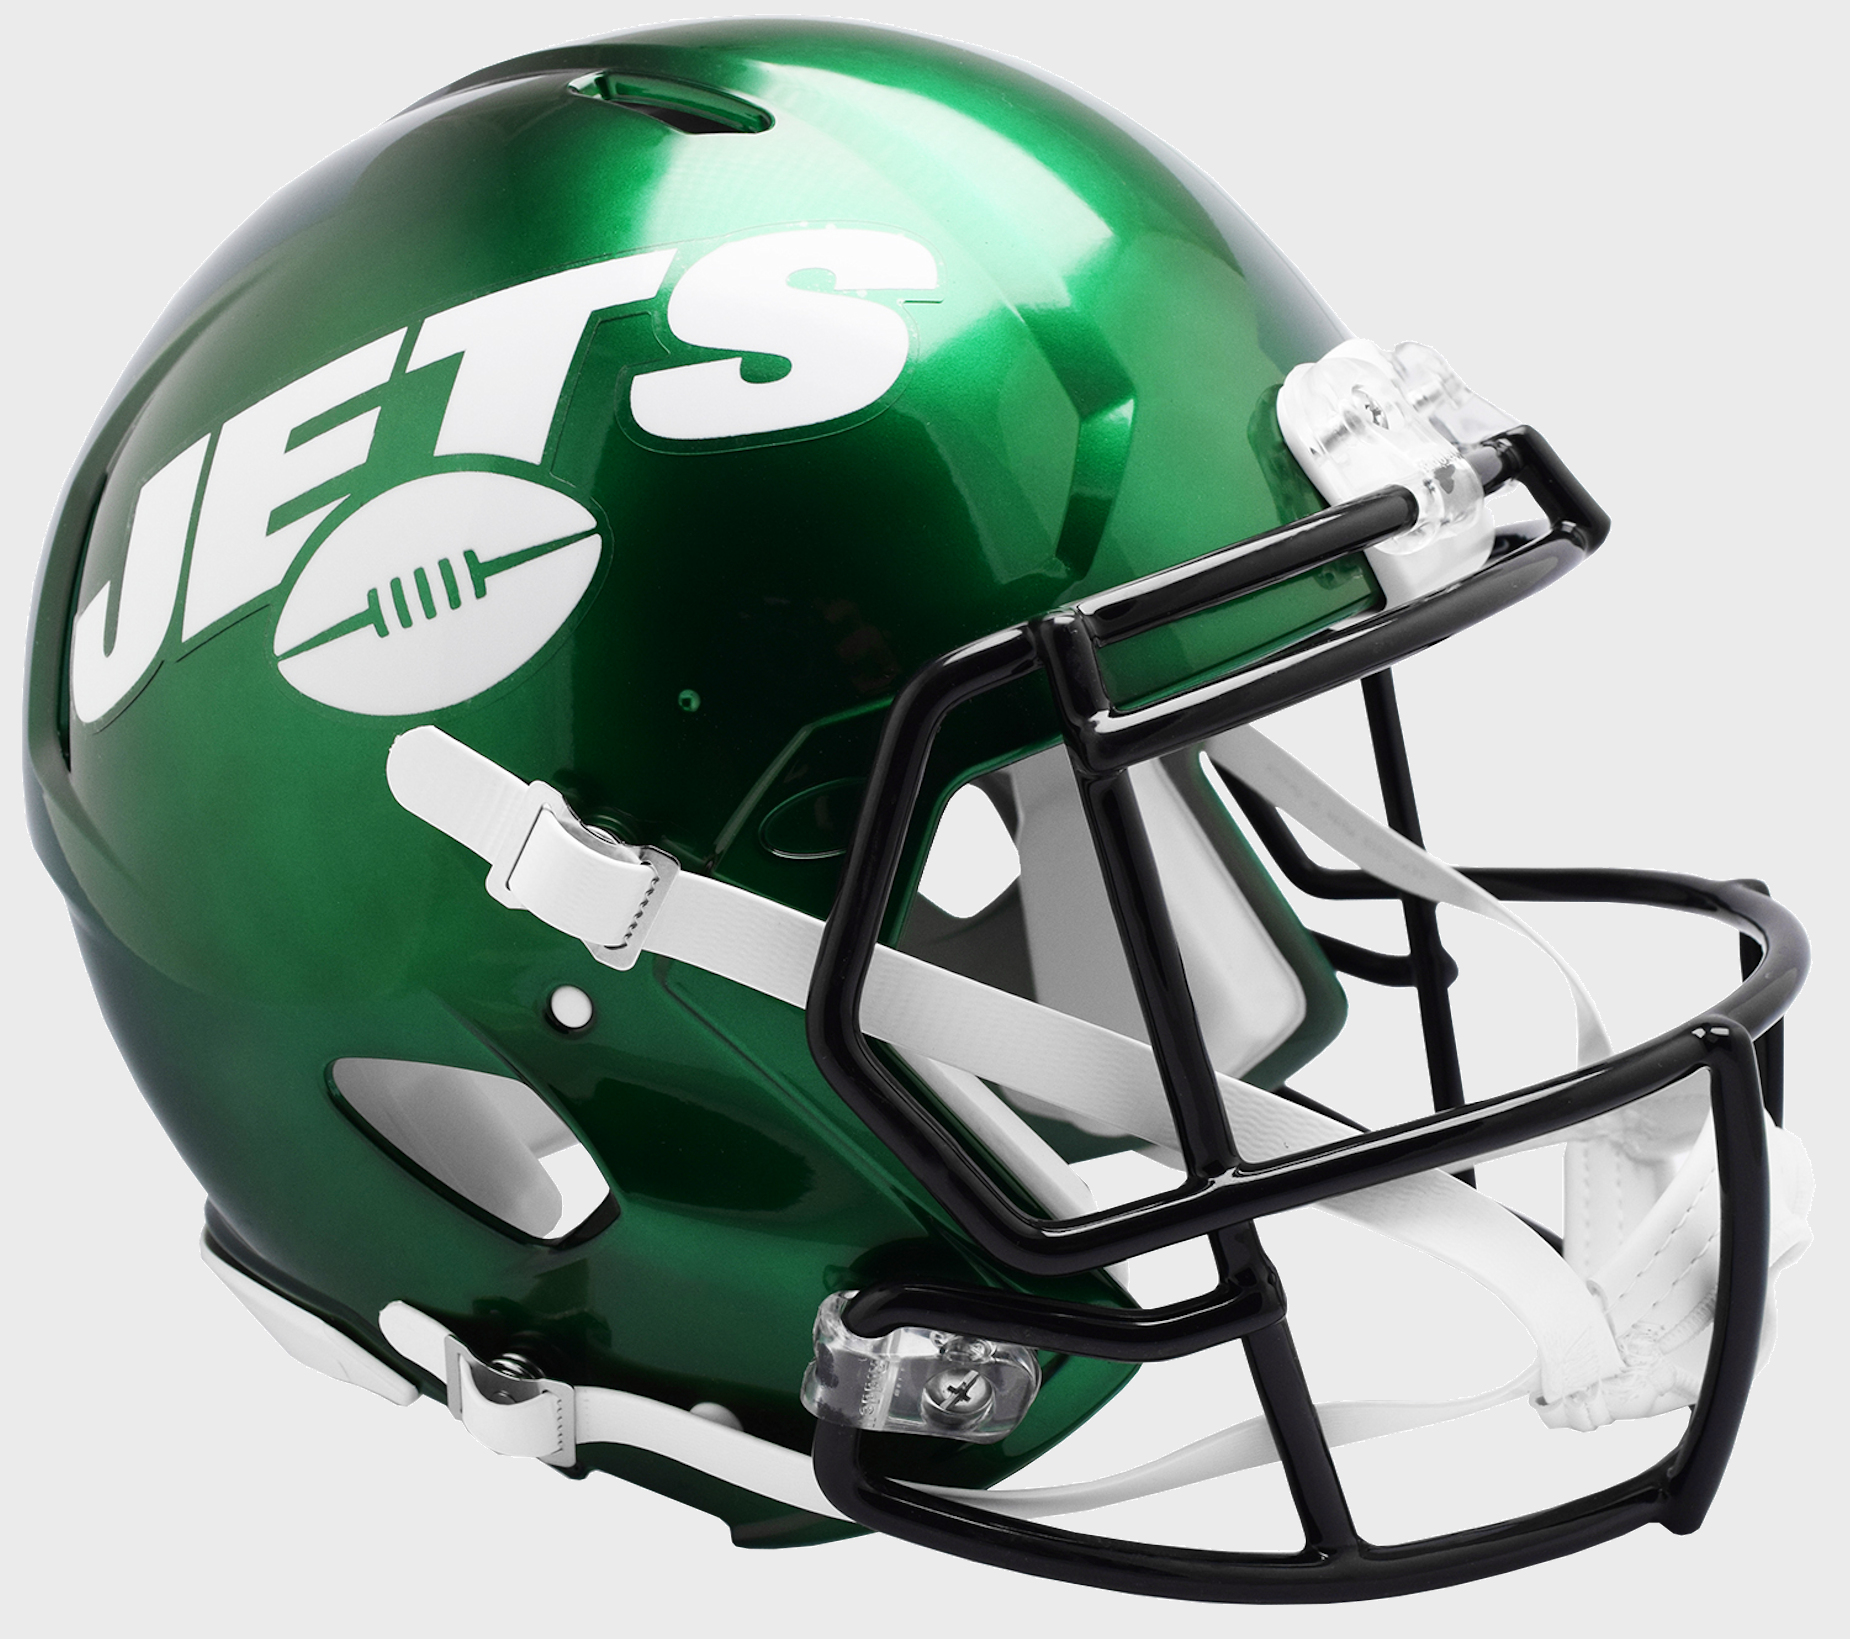 New York Jets Speed Replica Football Helmet